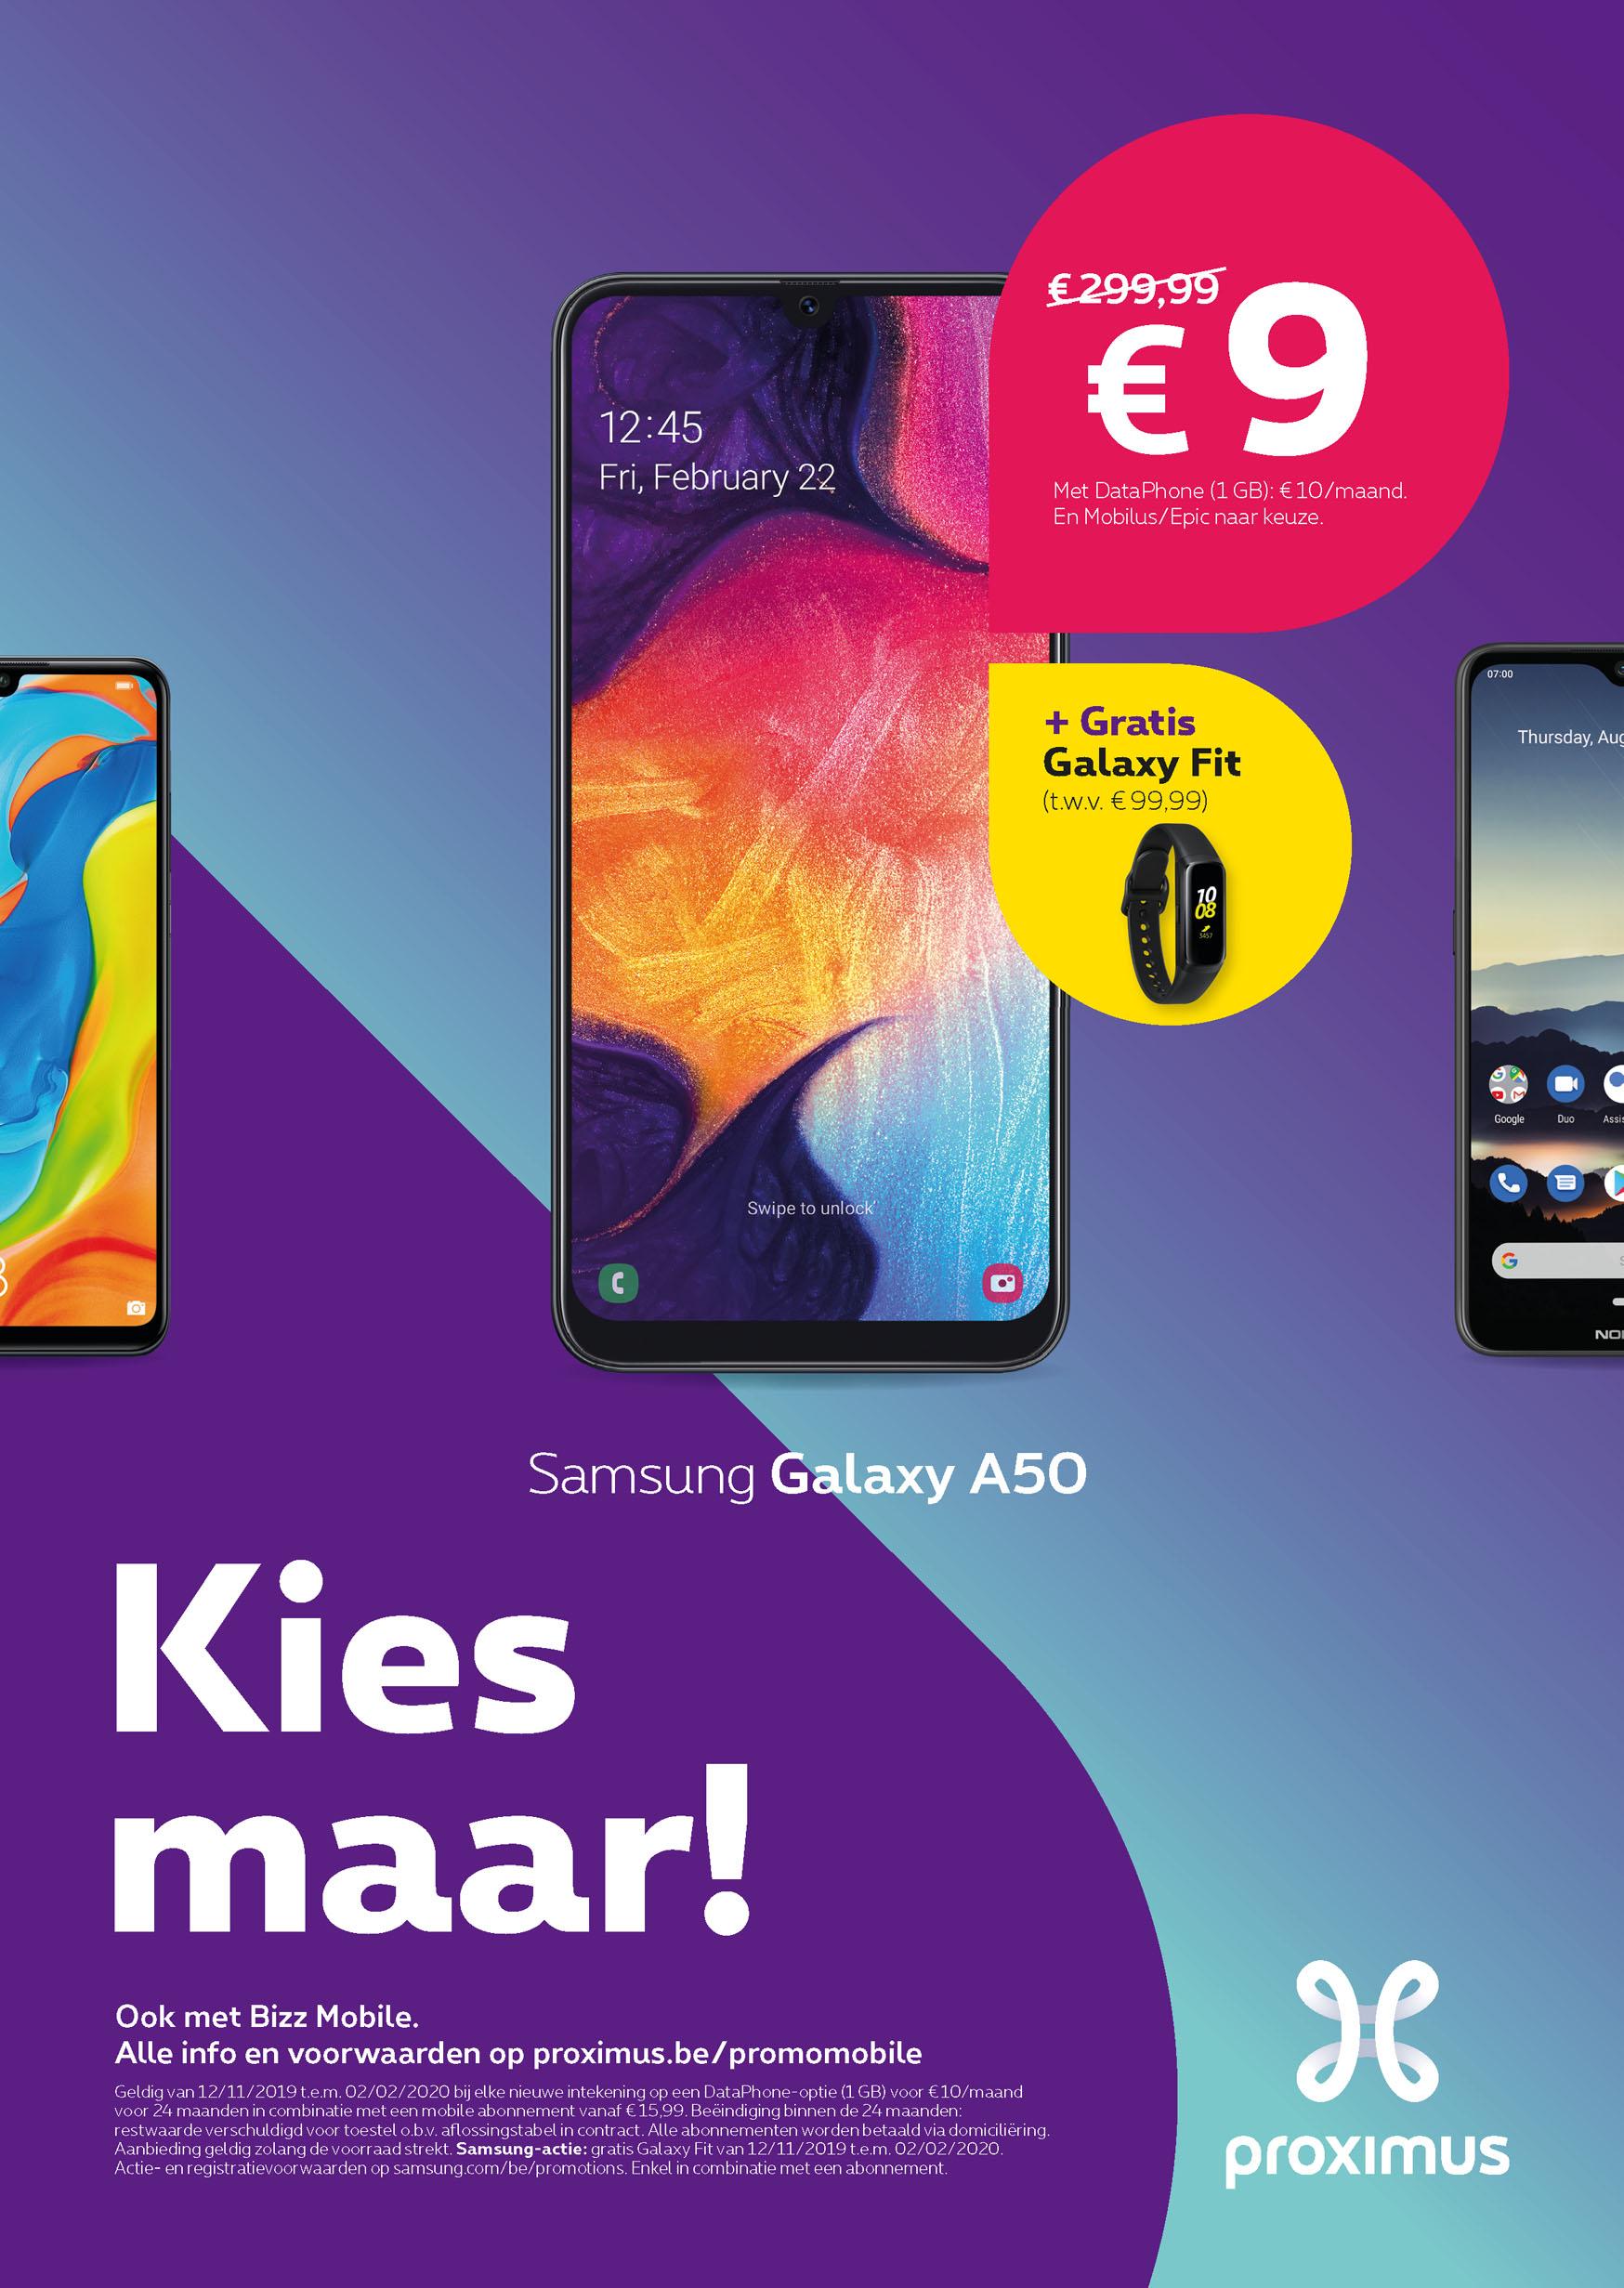 Promotions_JO_JO_Samsung_Galaxy_A50_2019